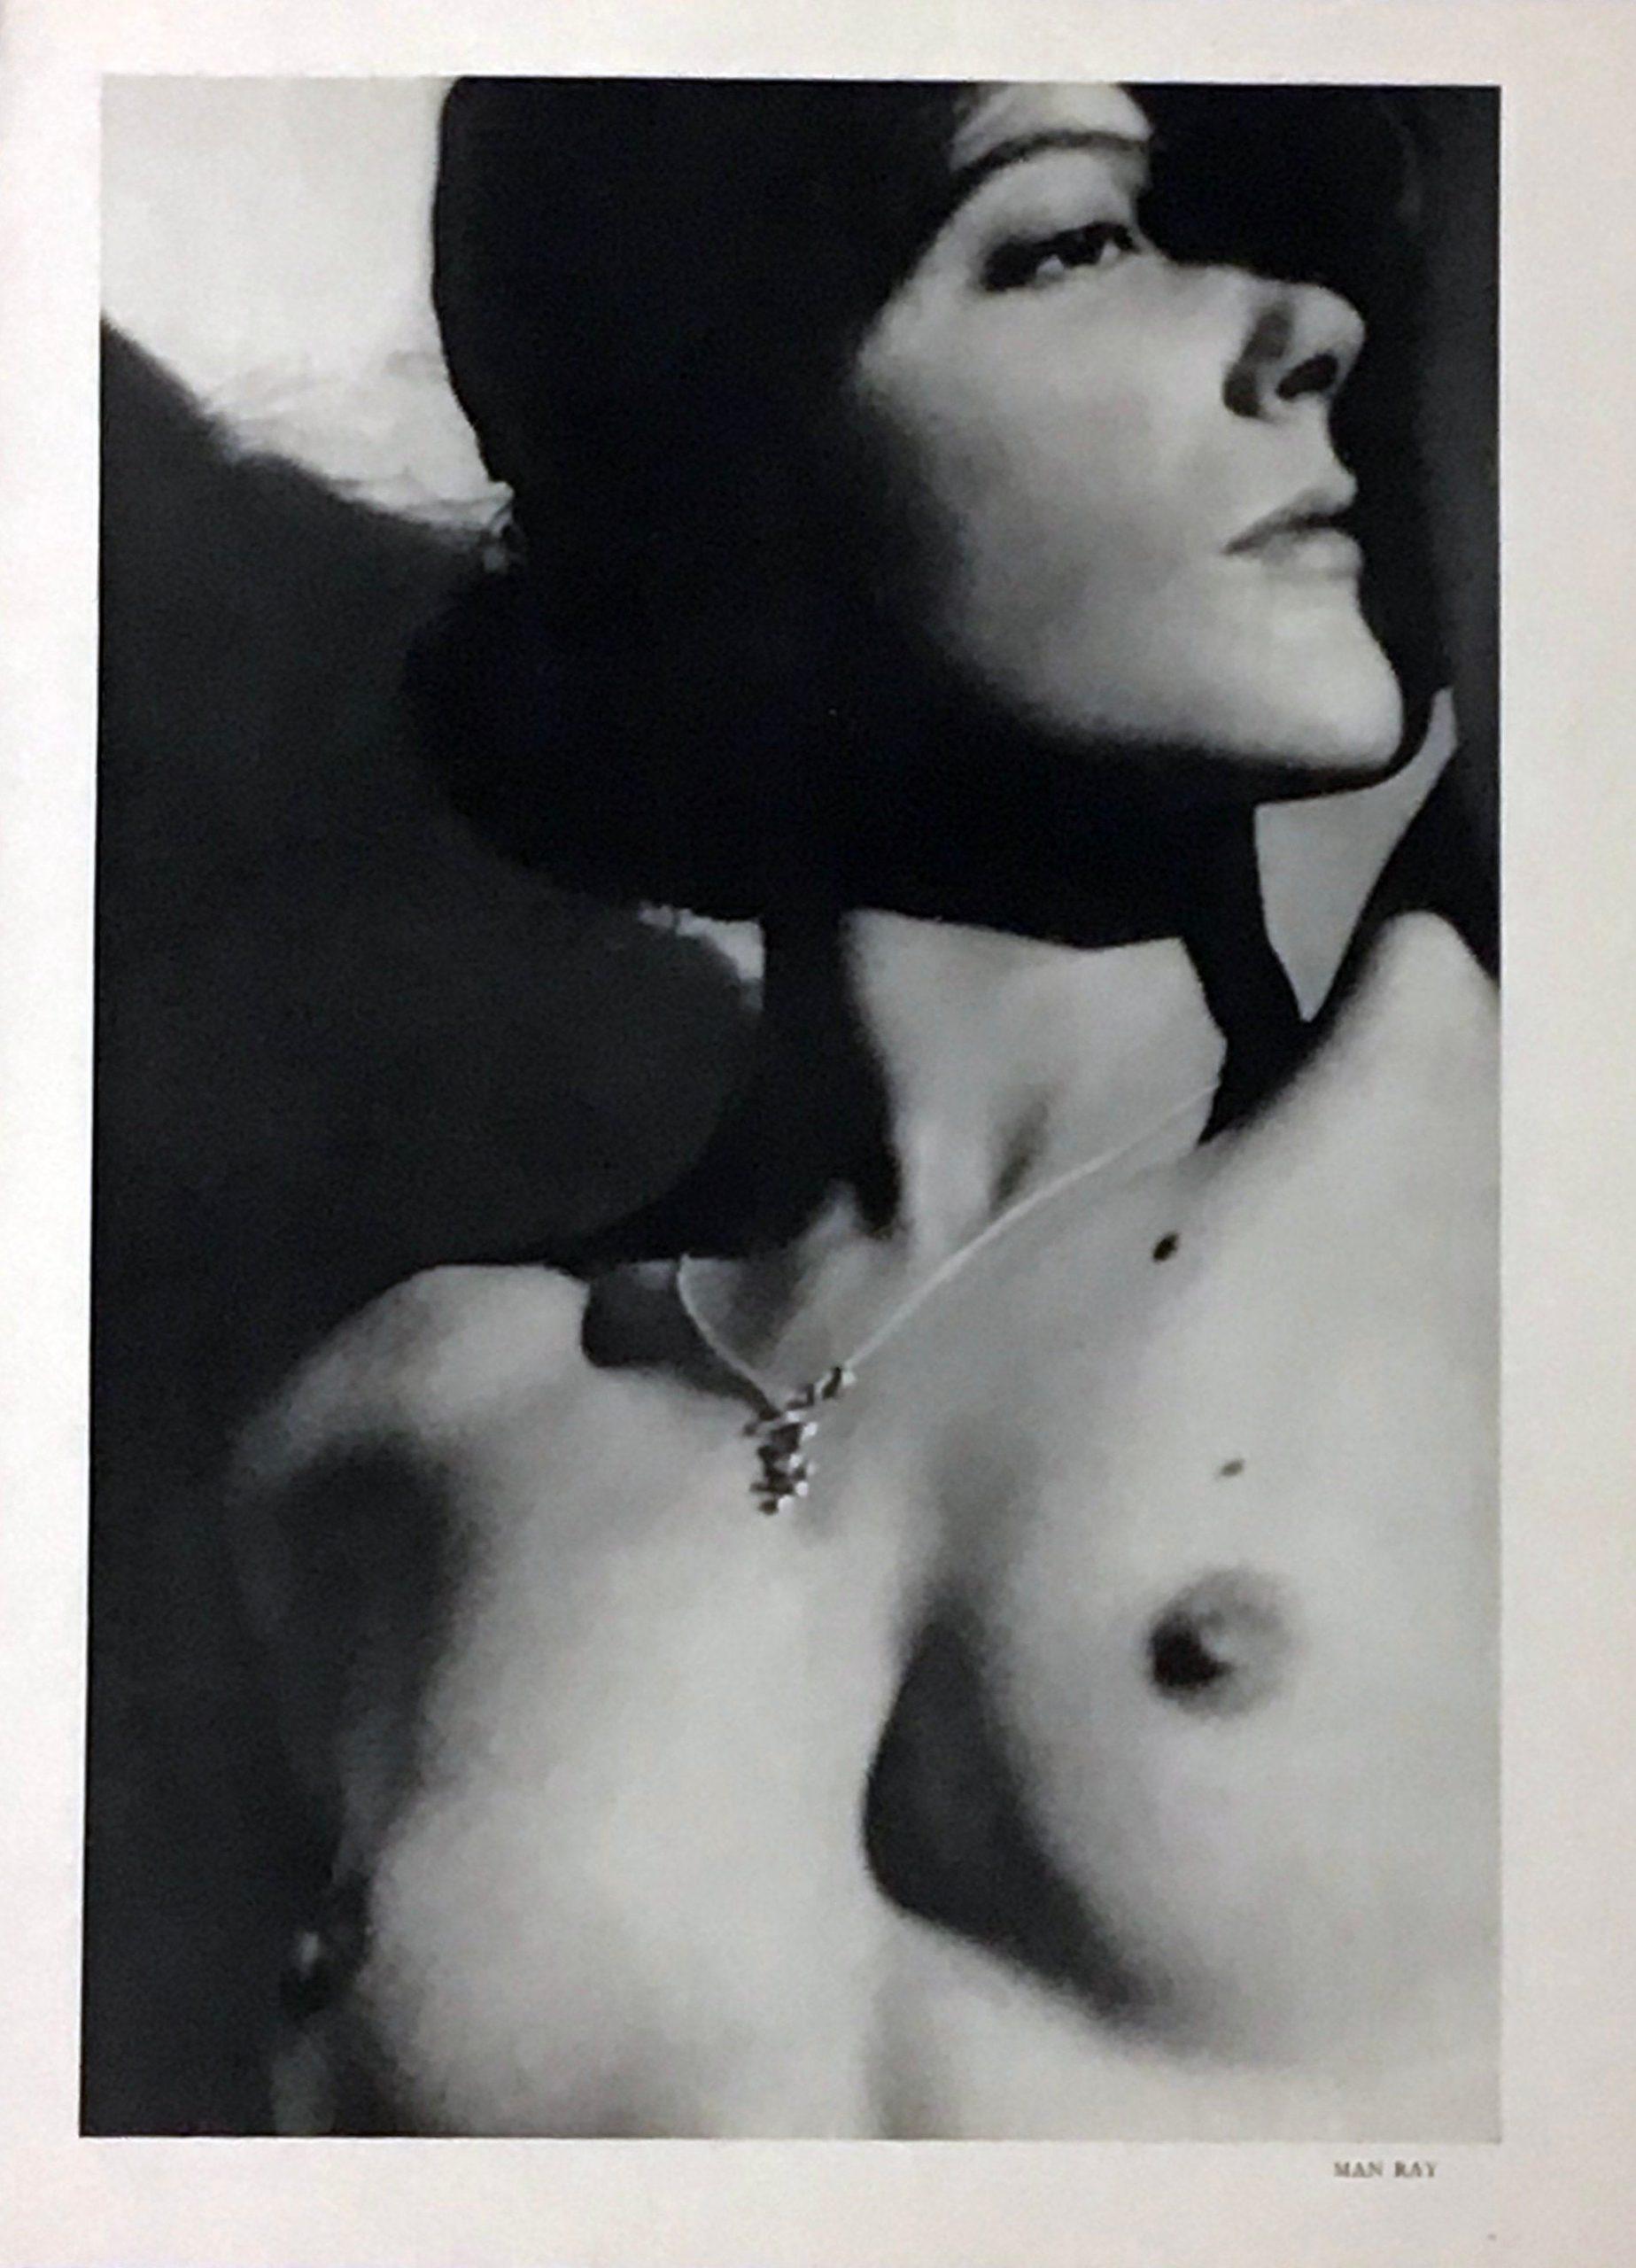 Man Ray Phhotogravure Nude 1, Verve 1939, Photography